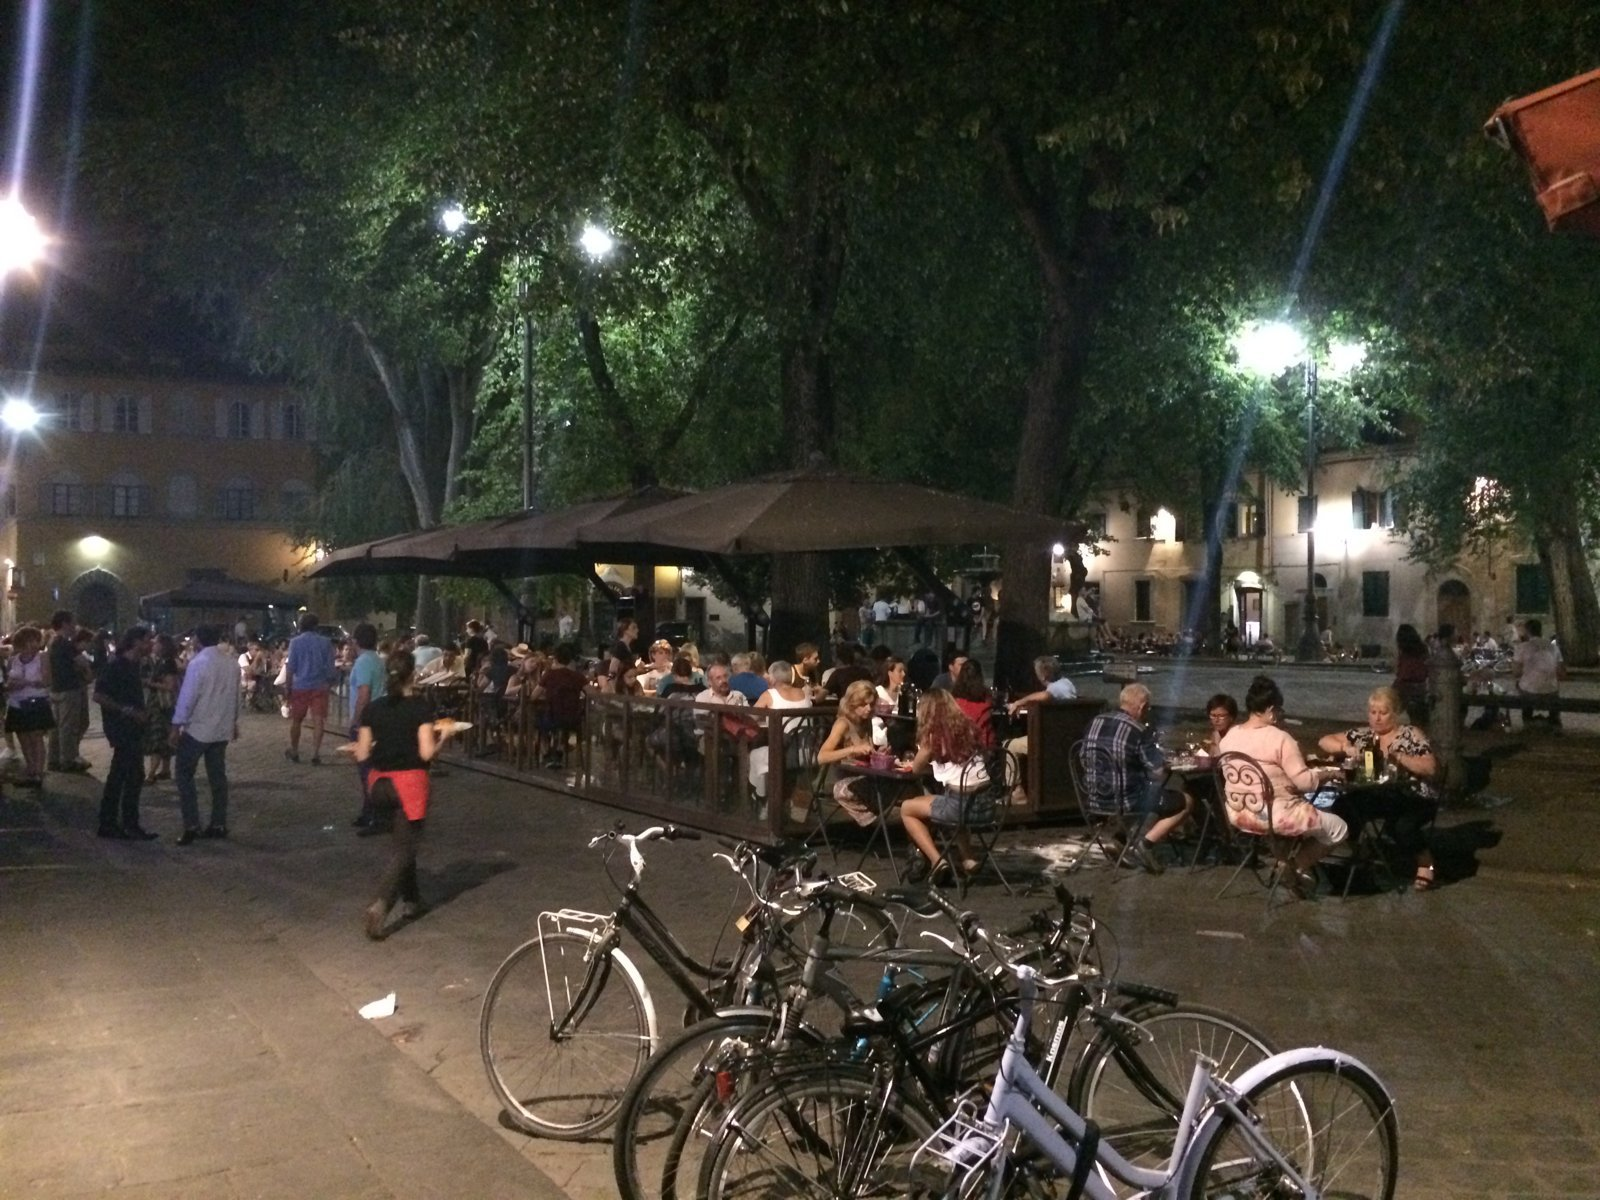 Nightlife in Piazzo Santo Spirito